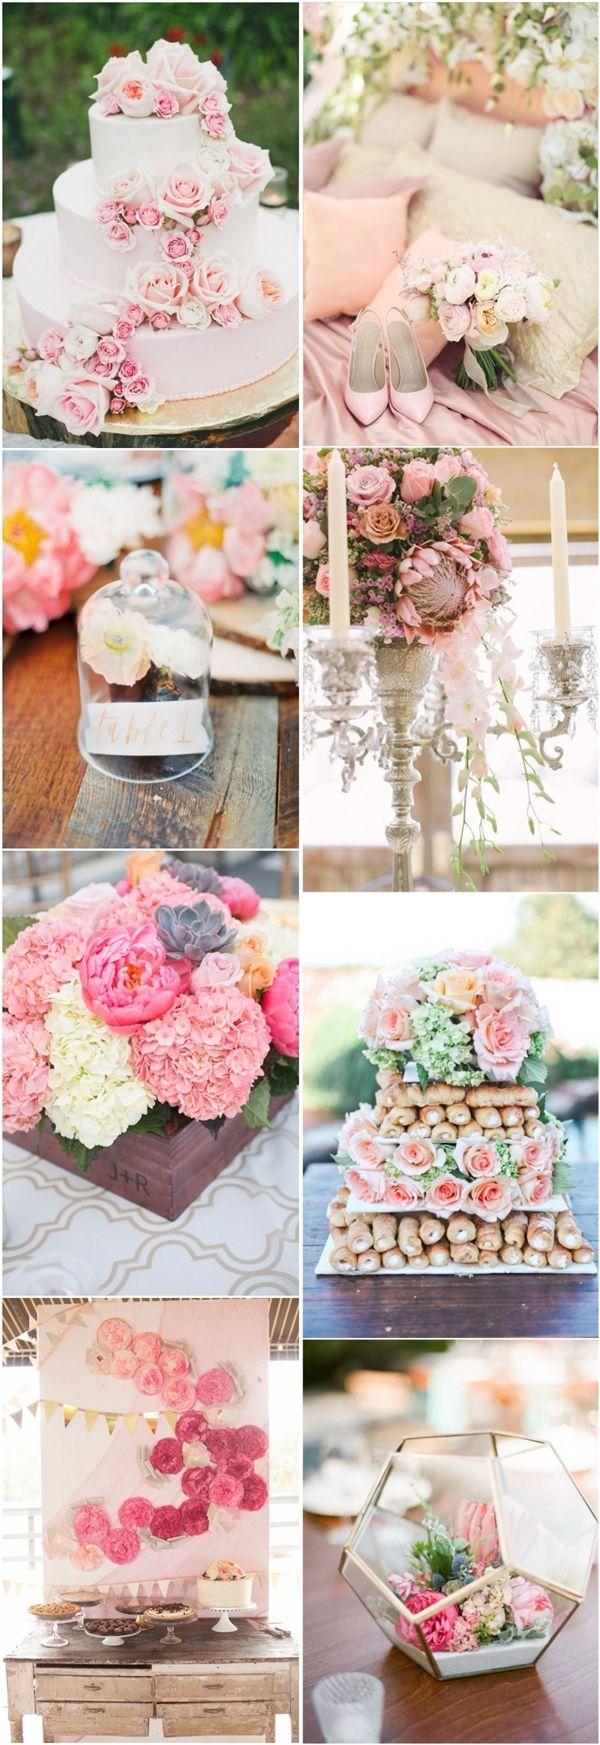 best 25 spring wedding themes ideas on pinterest spring wedding colors blue spring weddings. Black Bedroom Furniture Sets. Home Design Ideas